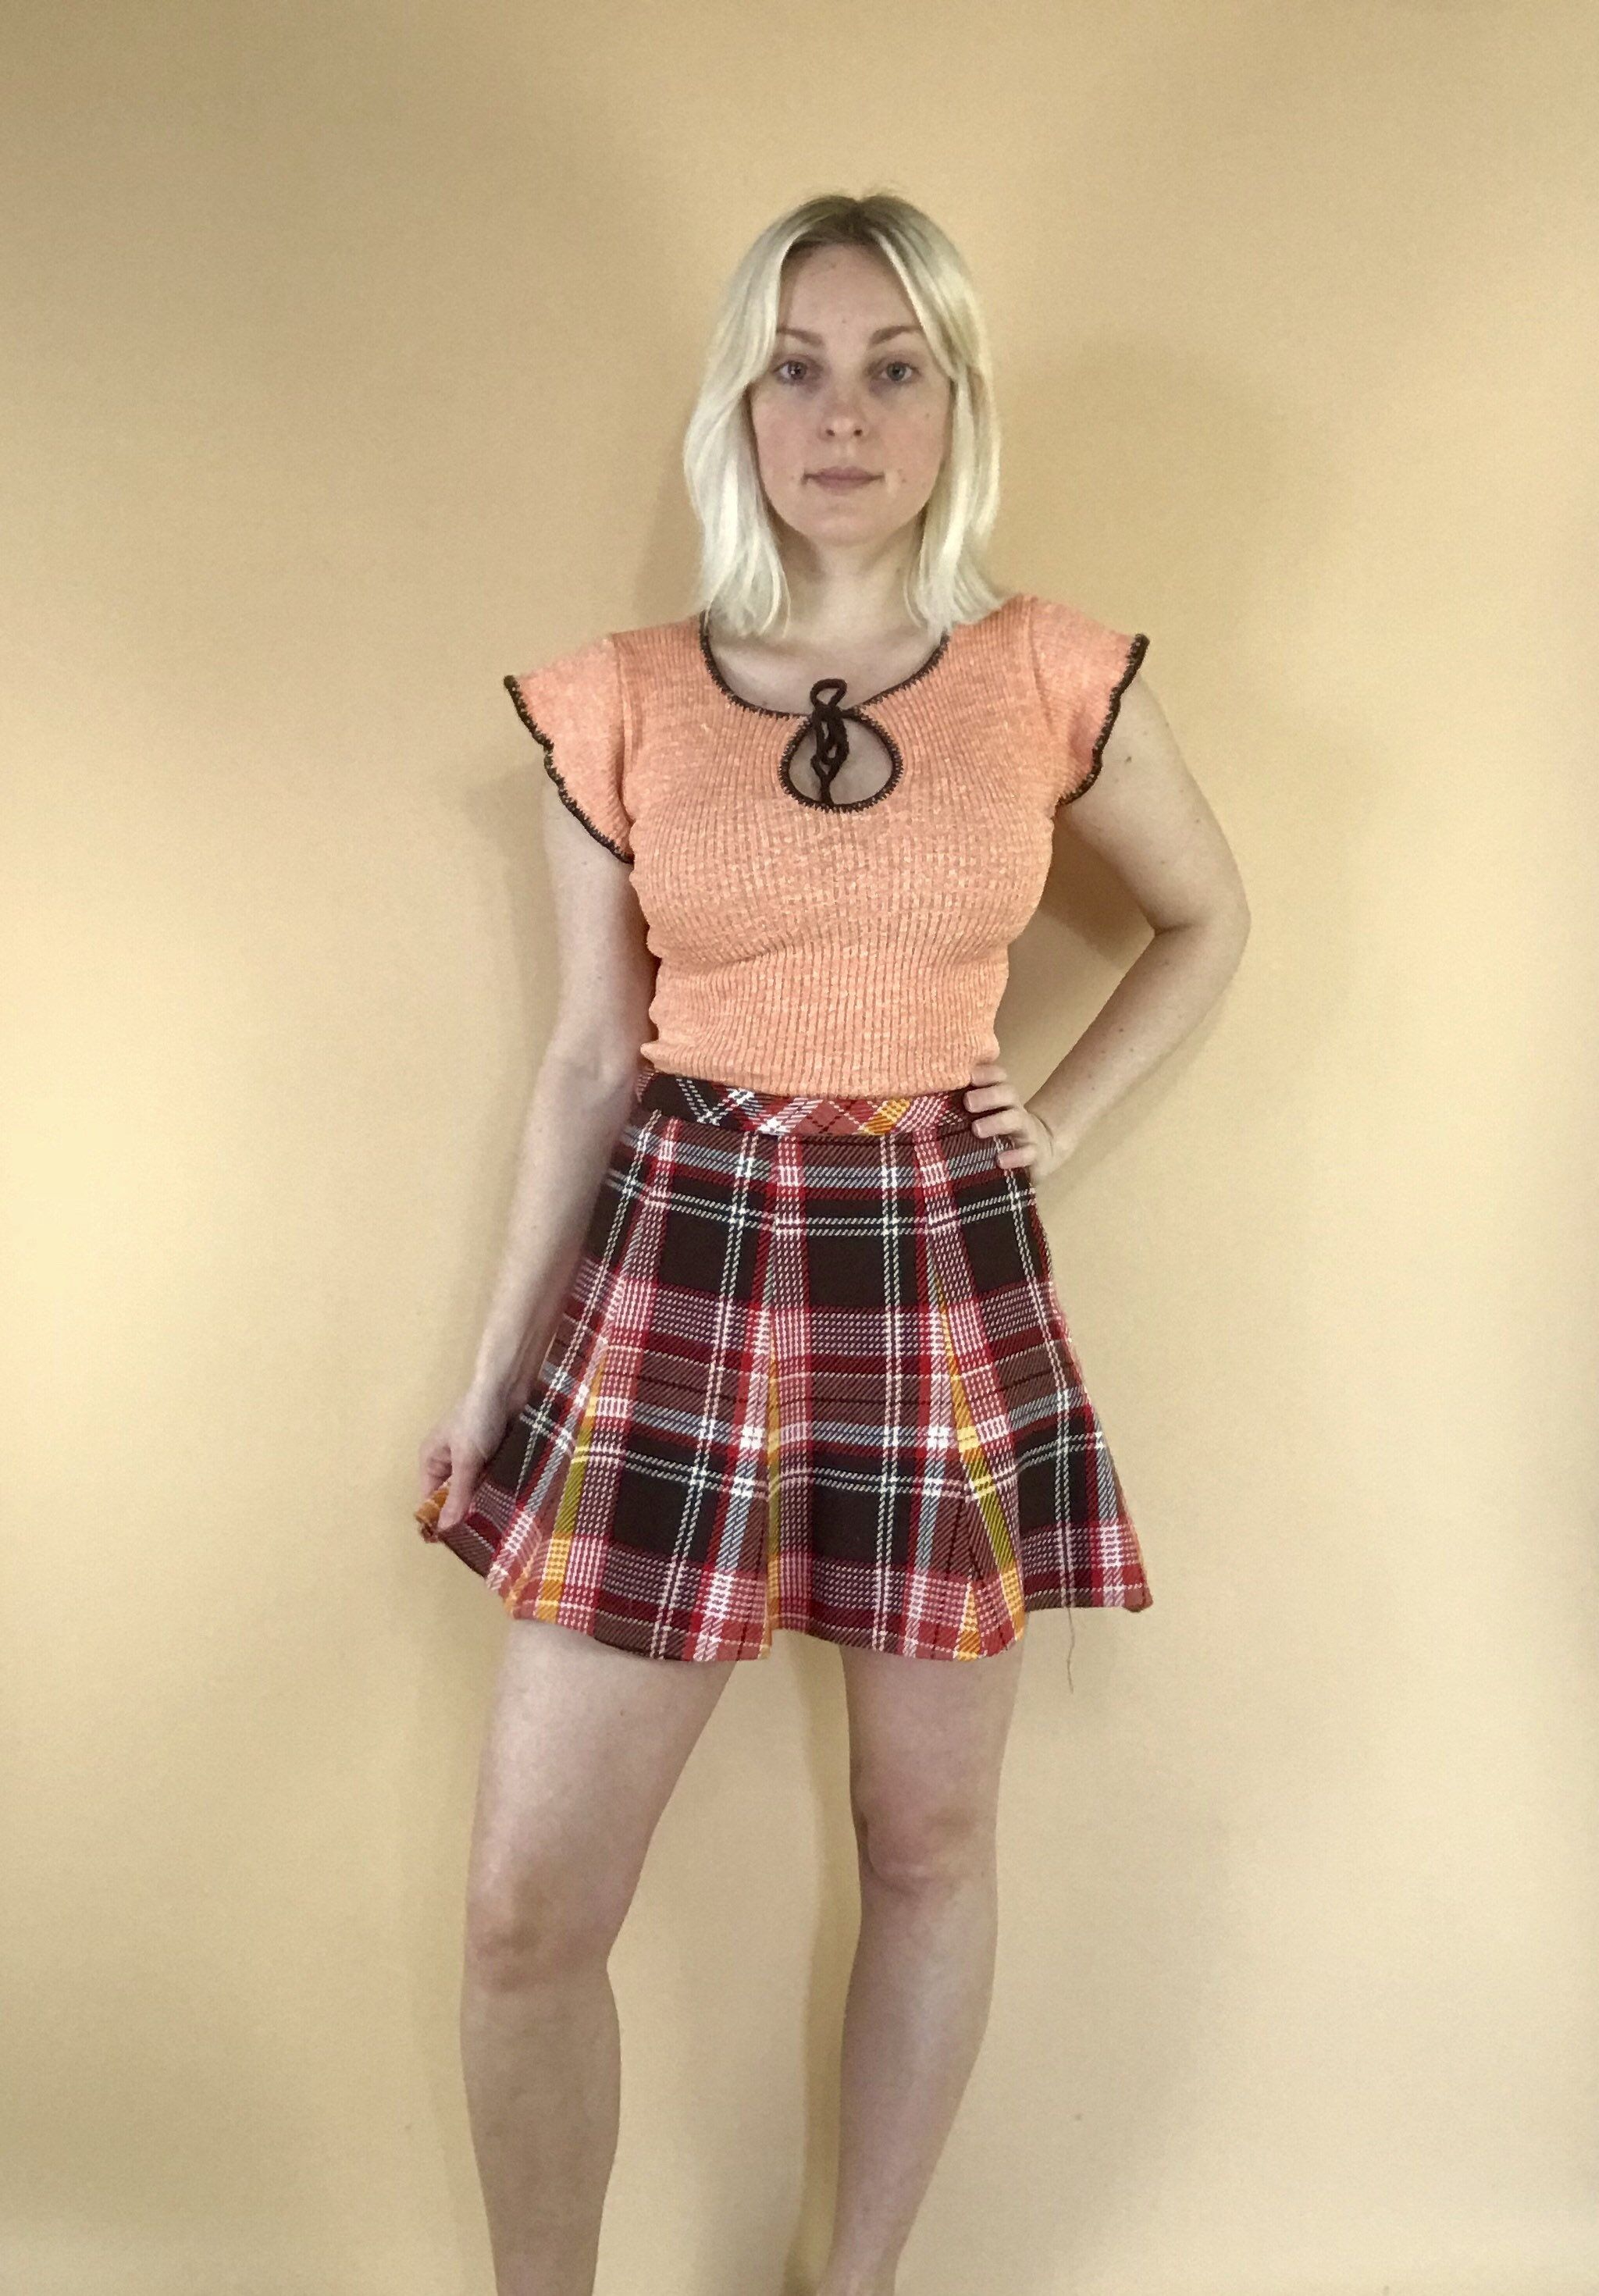 0c1cc33de9 1970s plaid mini skirt vintage Bobbie Brooks tartan high waisted micro mini  skirt retro 70s school girl uniform pleated skirt 26/27